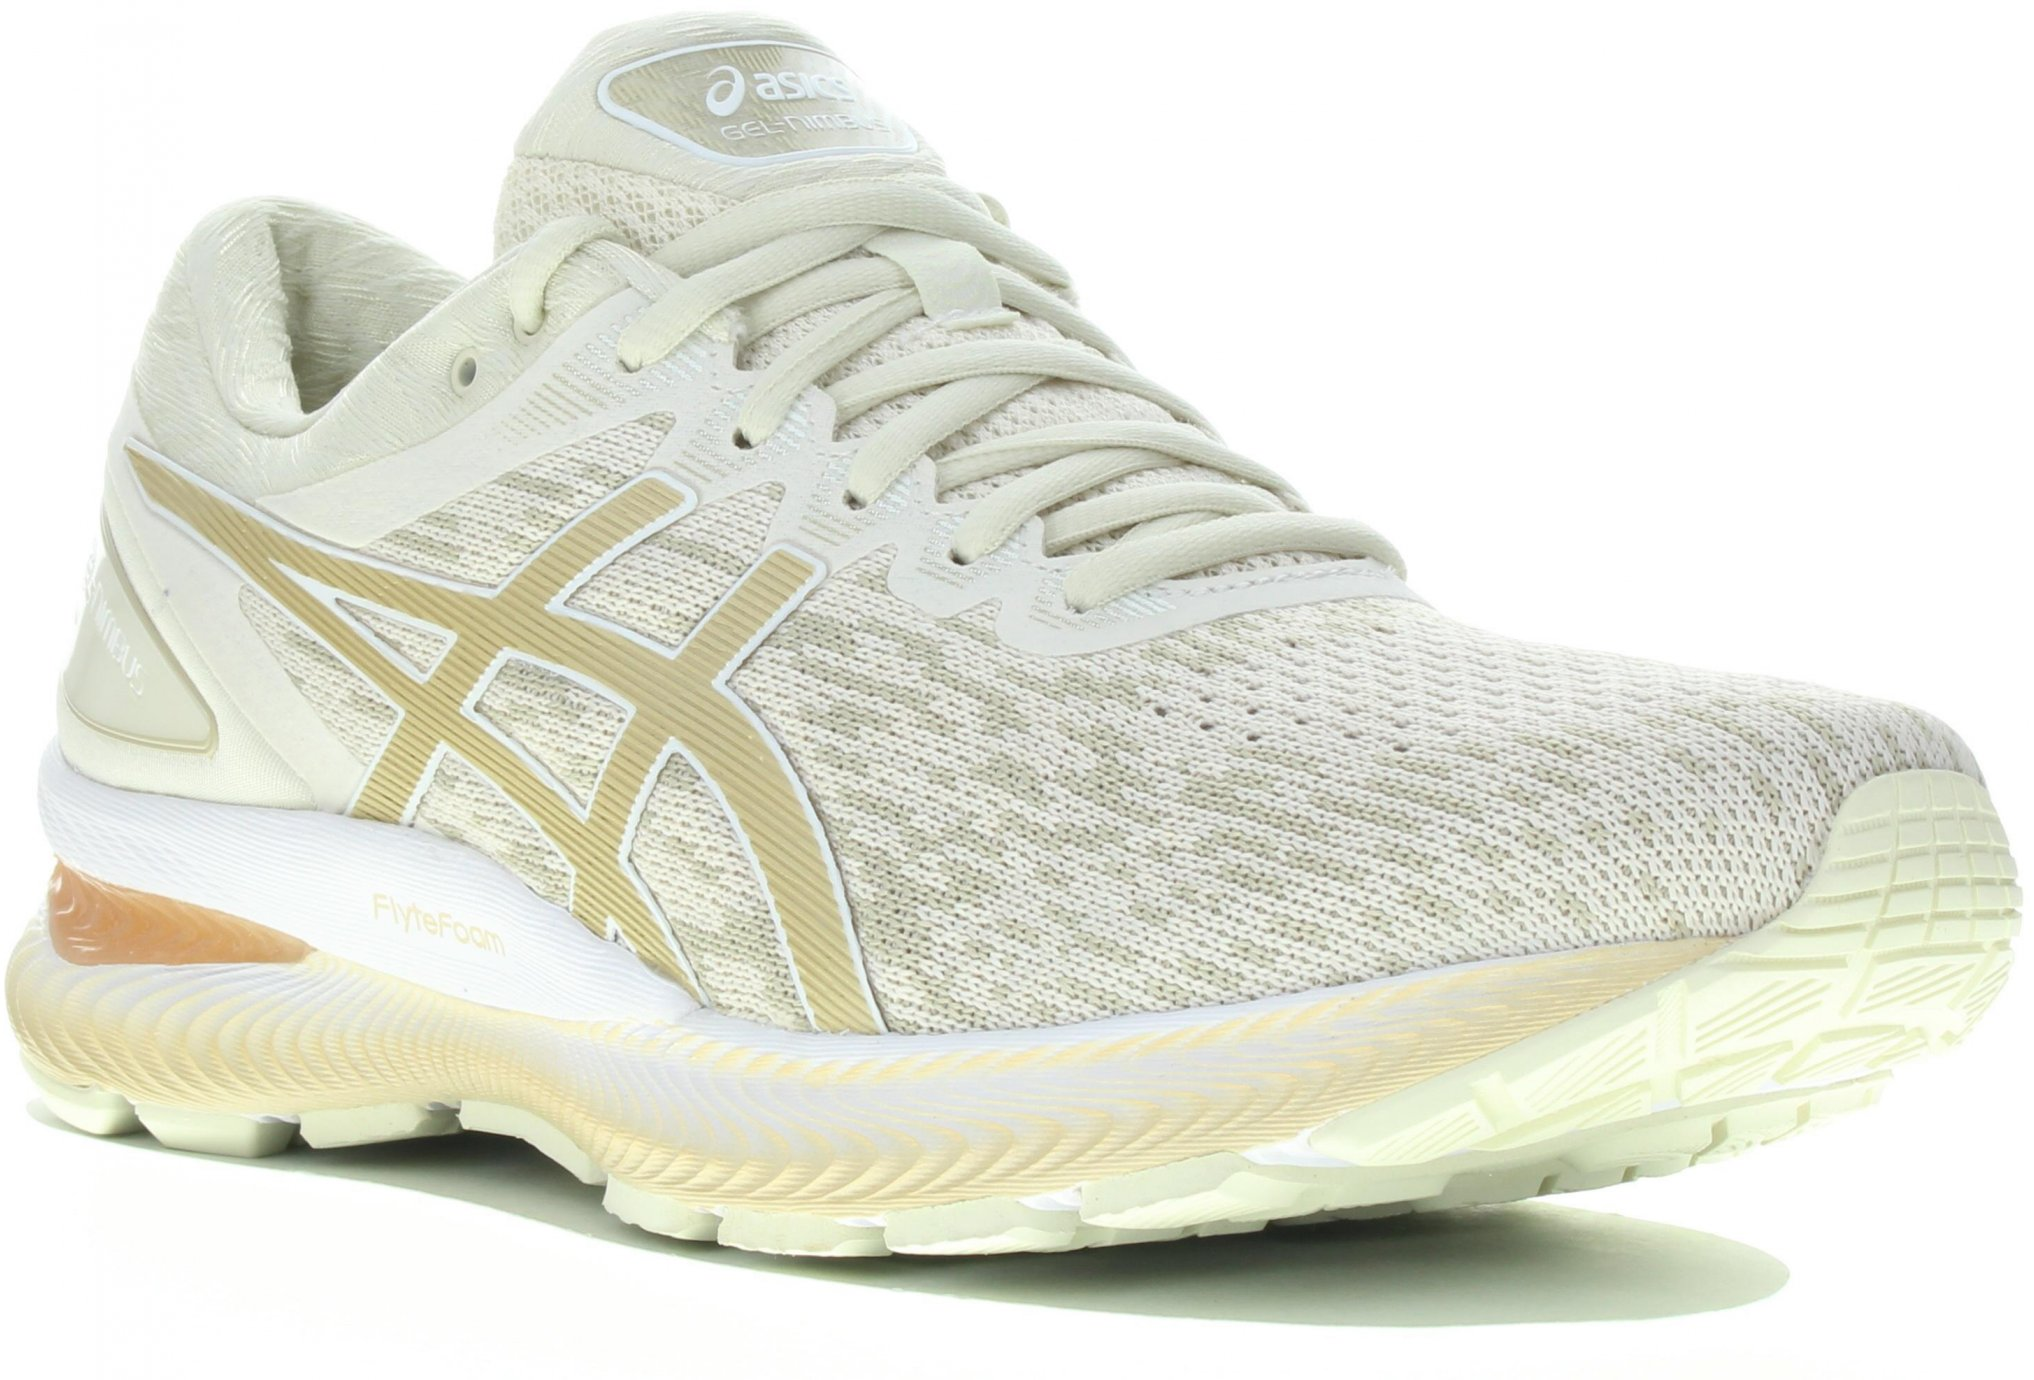 Asics Gel-Nimbus 22 Knit W Chaussures running femme